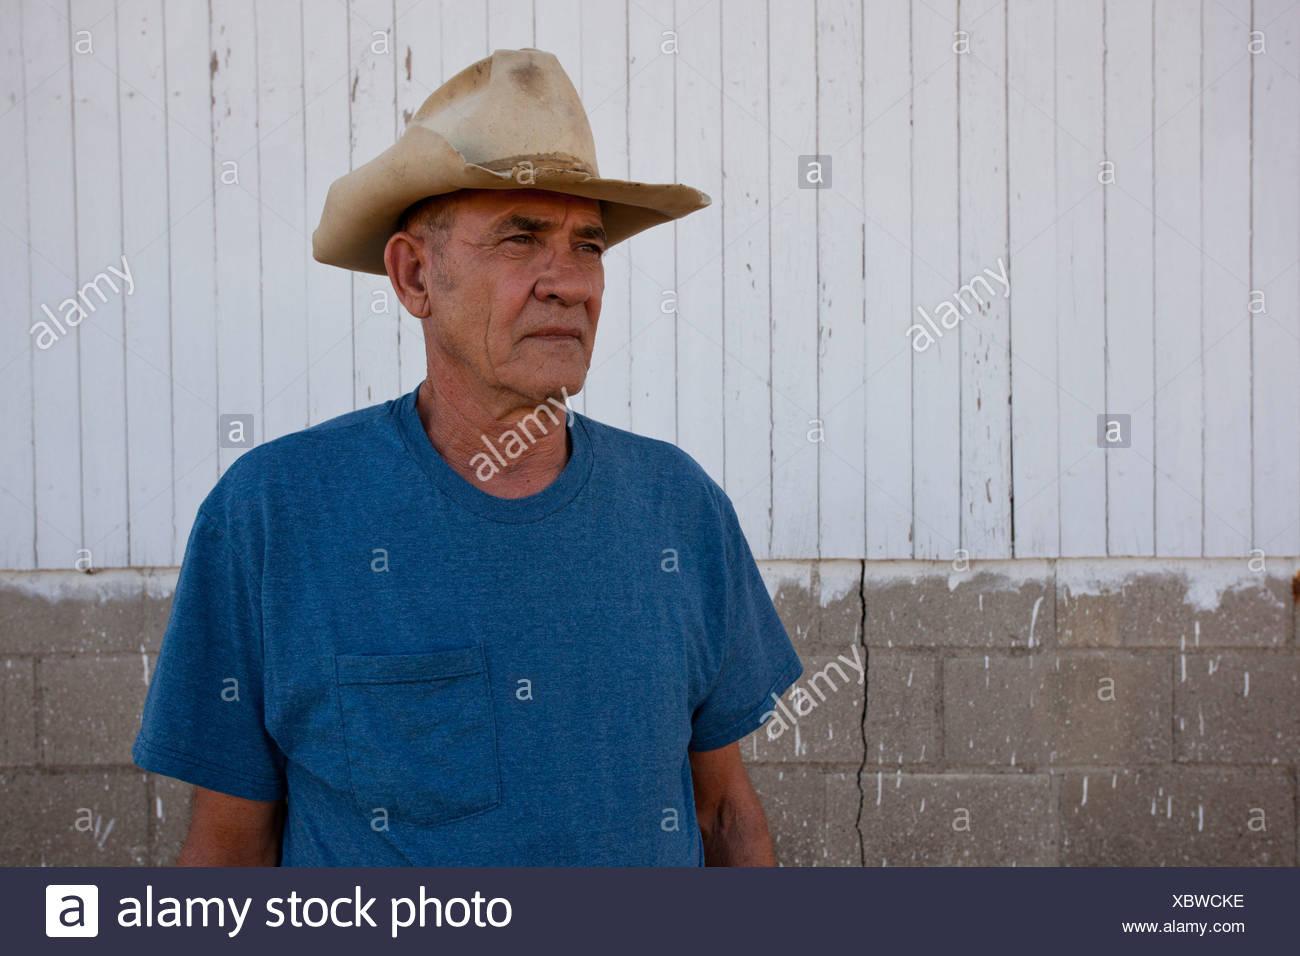 3db32820301 Old Man Wearing Hat Stock Photos   Old Man Wearing Hat Stock Images ...